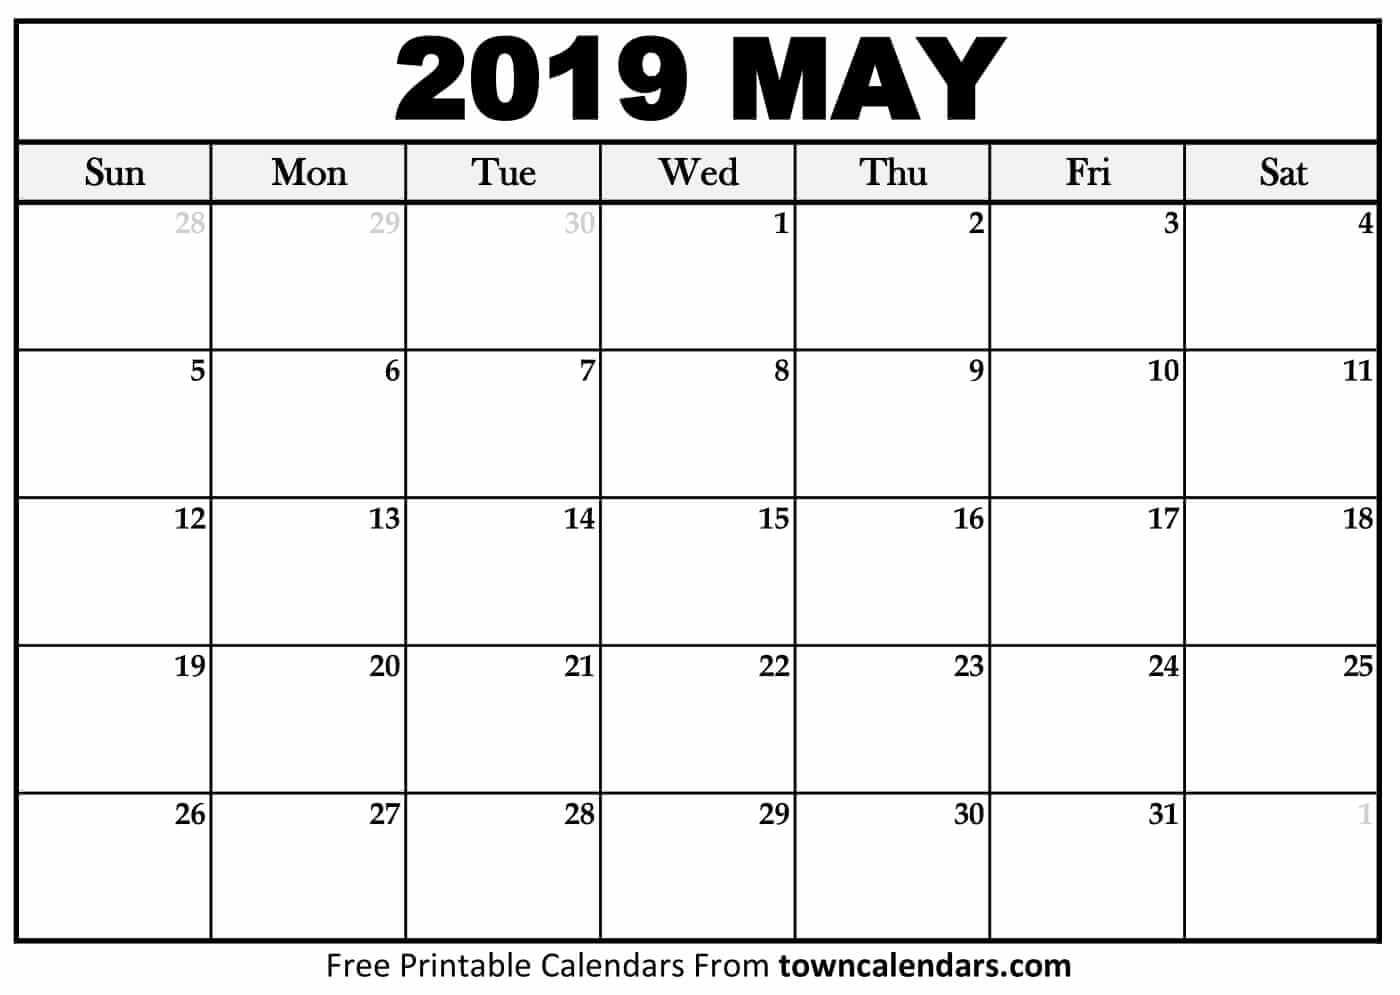 May Calendar 2019 Sheet